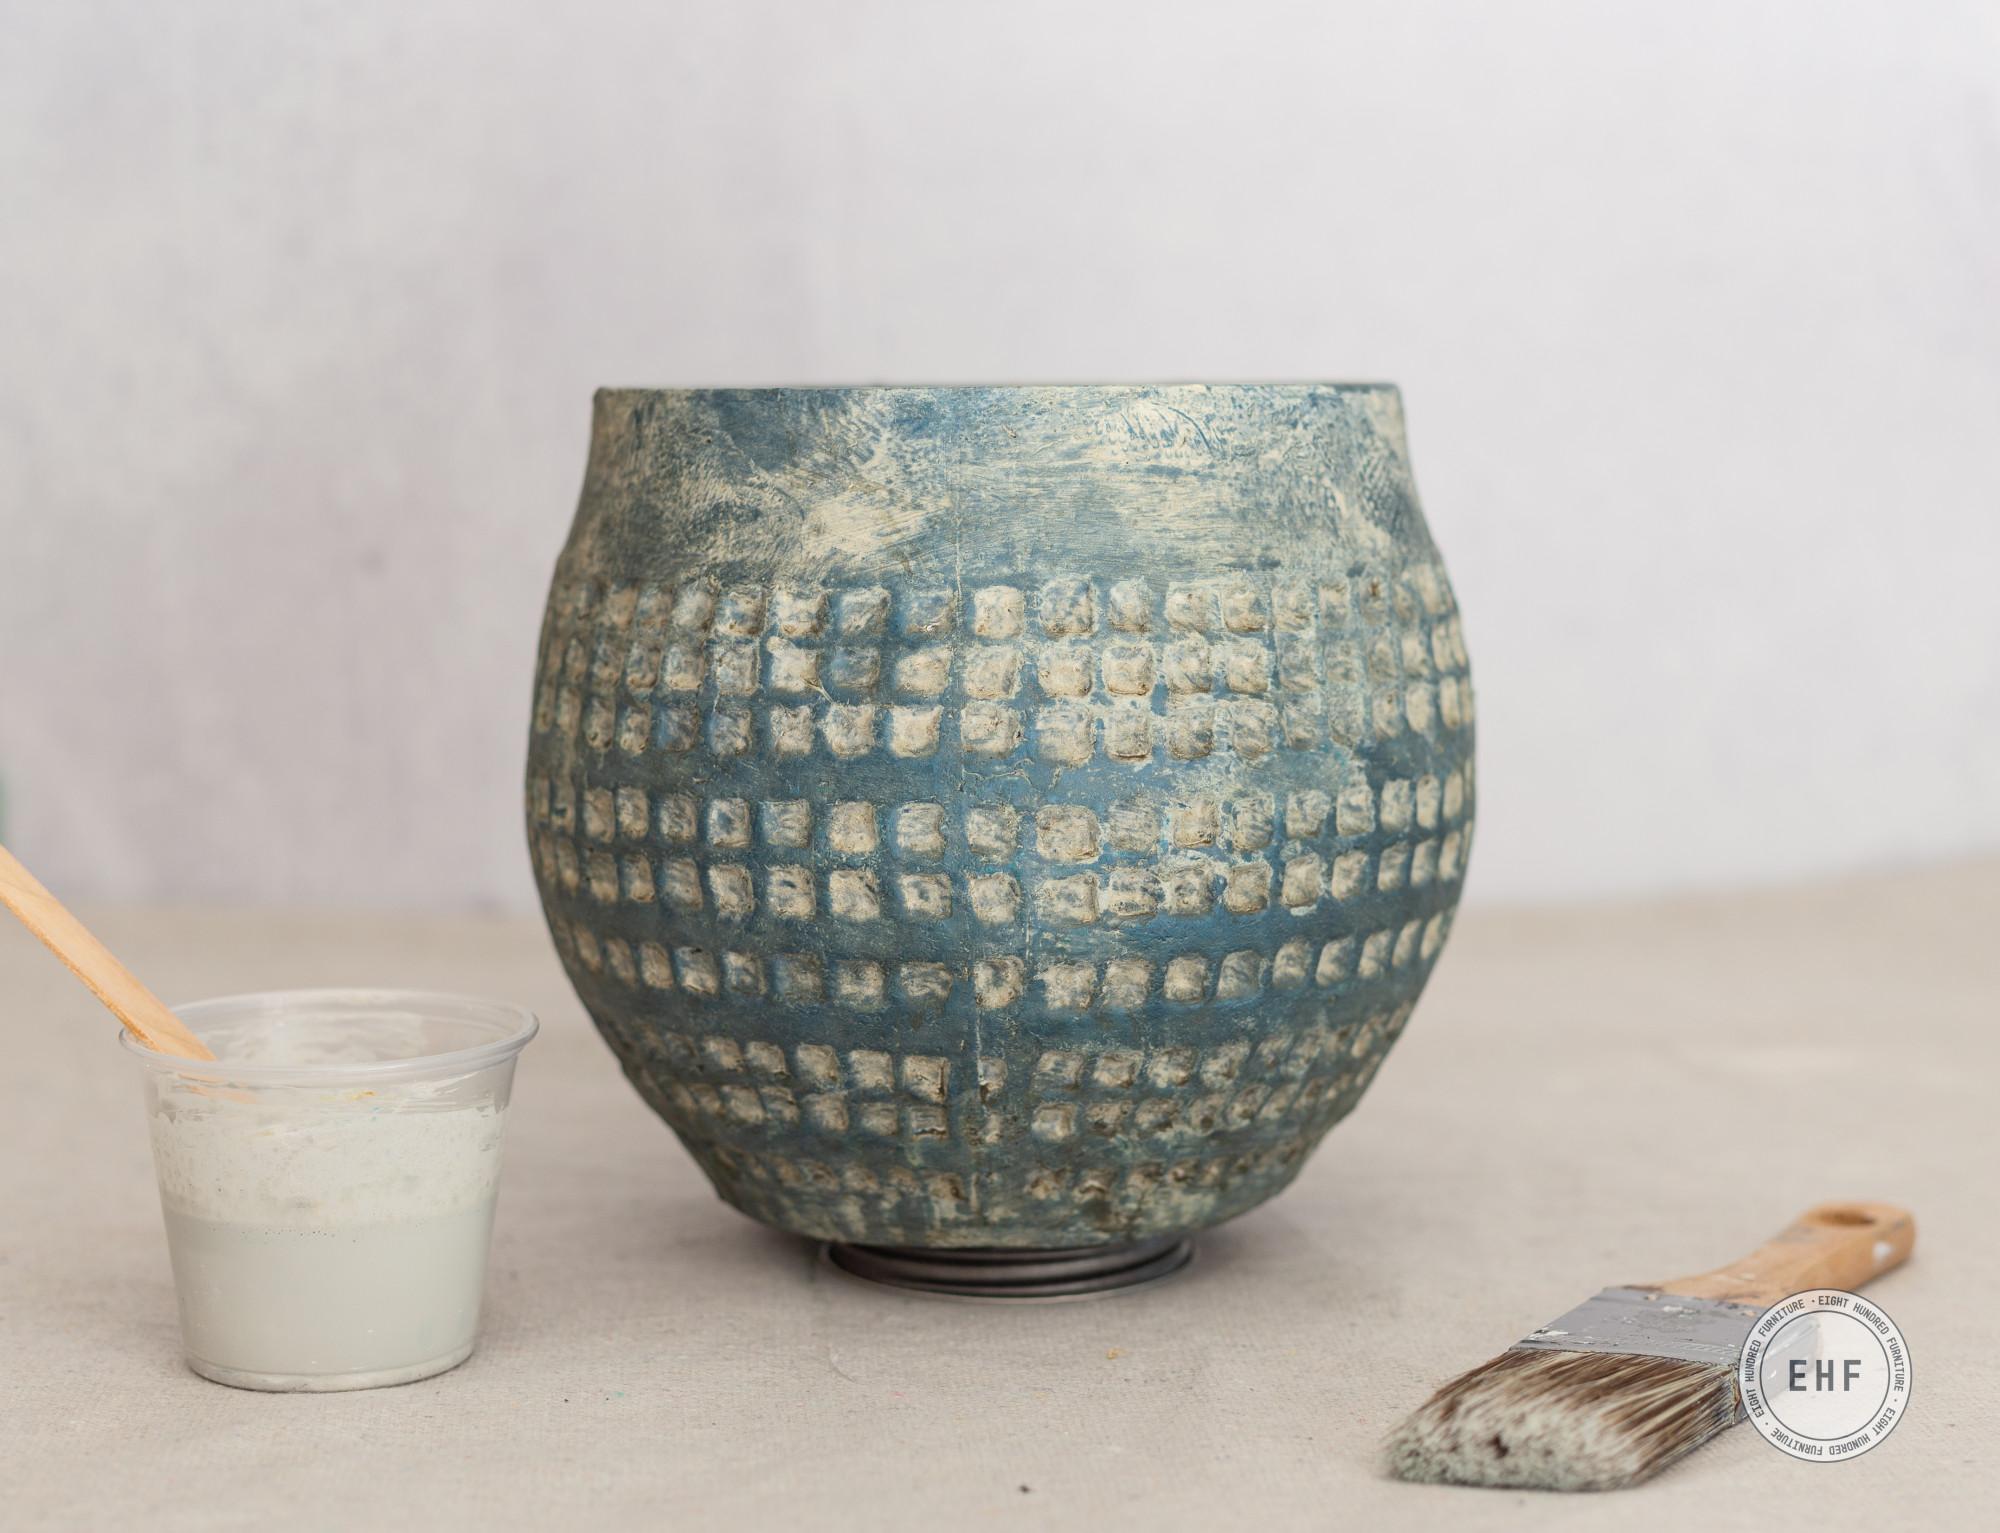 Teal ceramic pot, Mora Milk Paint, Miss Mustard Seed's Milk Paint, Eight Hundred Furniture